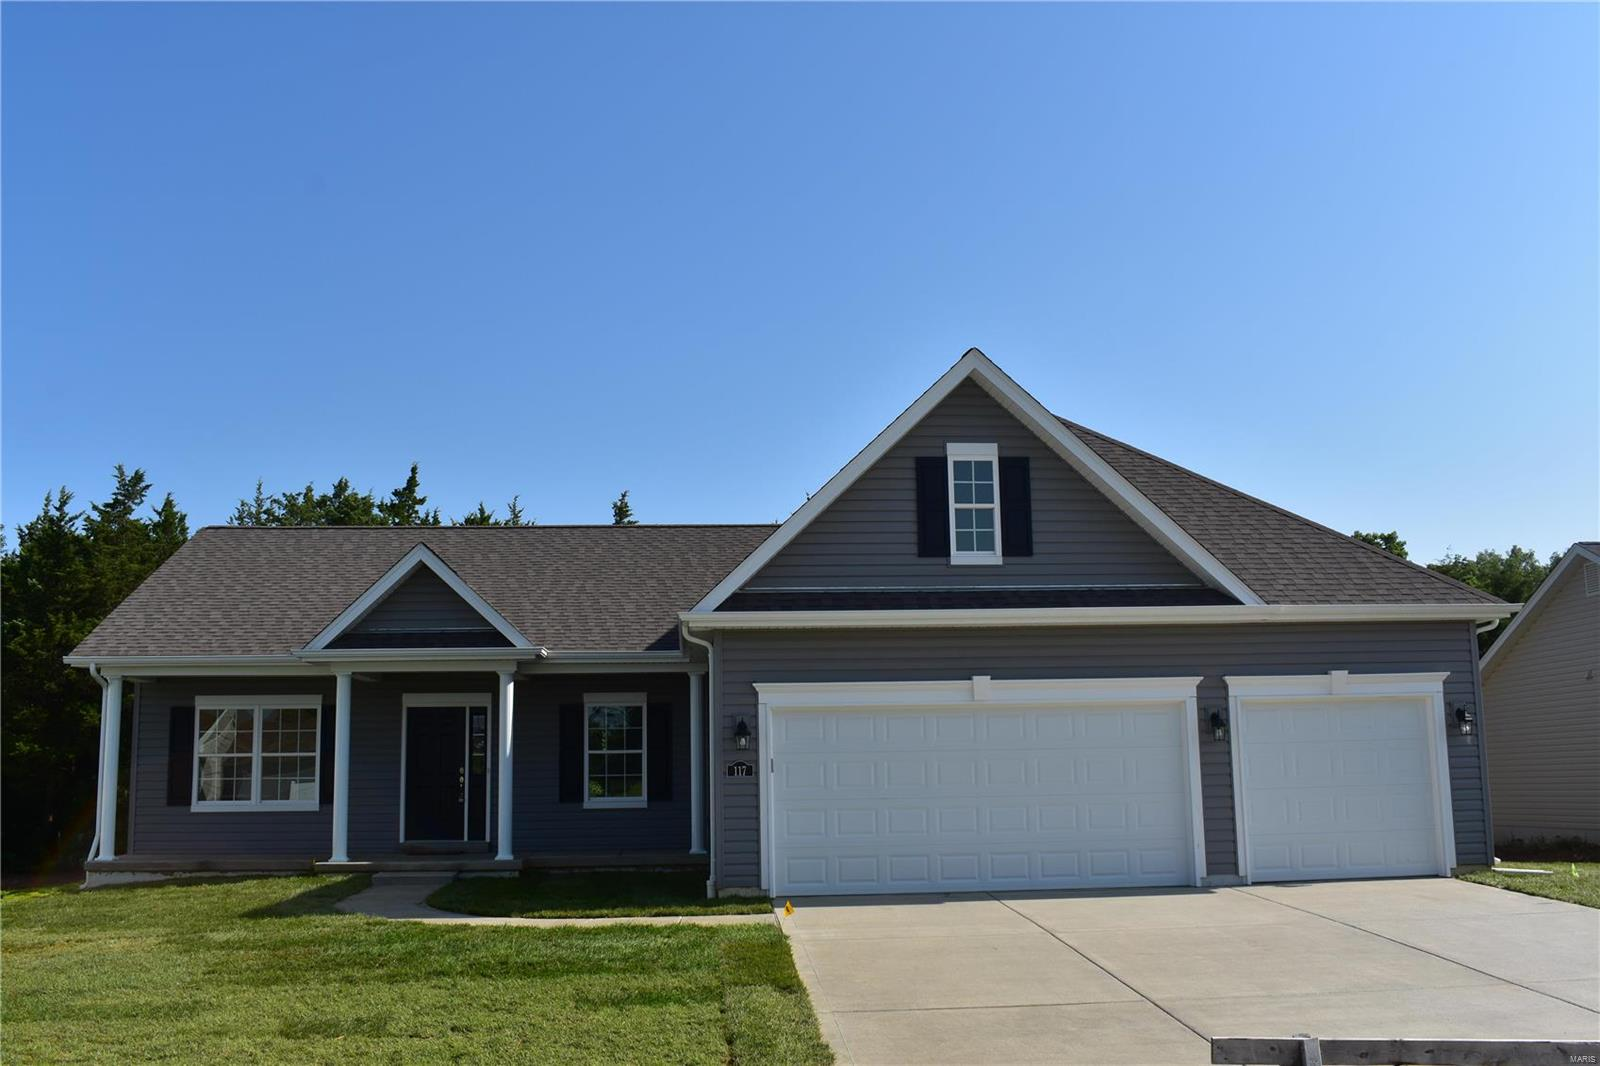 304 TBB-Lot 41 Carolyn Circle Property Photo - Wright City, MO real estate listing